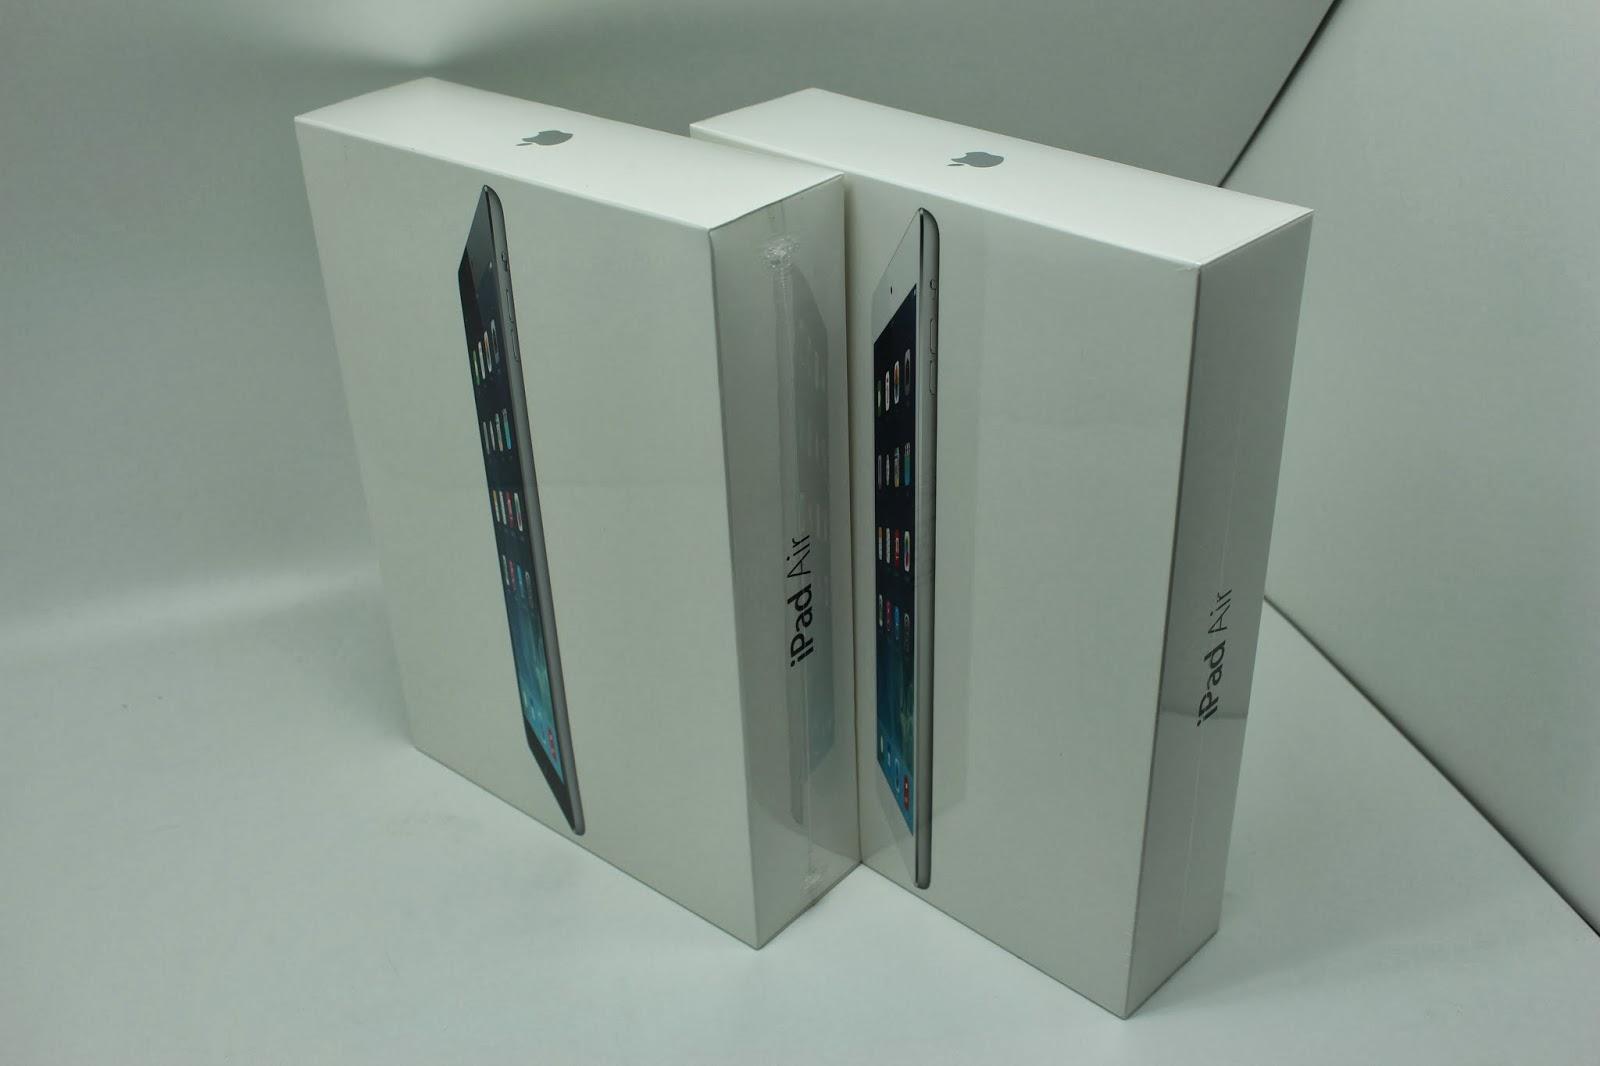 Jual Ipad Air 2 Wifi Only 16GB Garansi Internasional 1thn